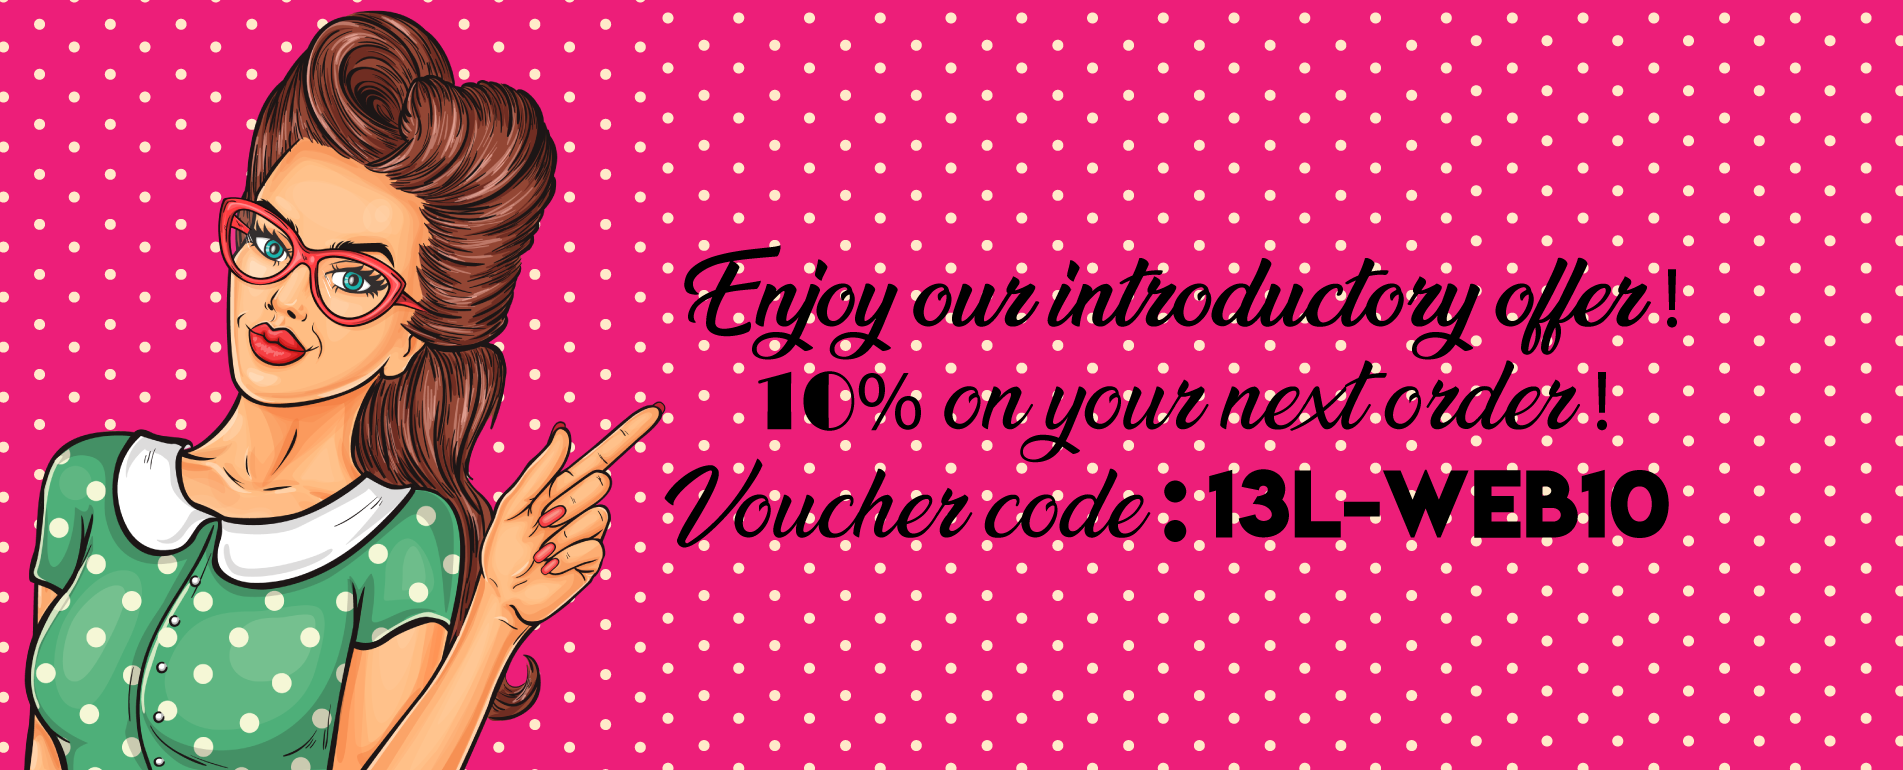 Voucher code new web site